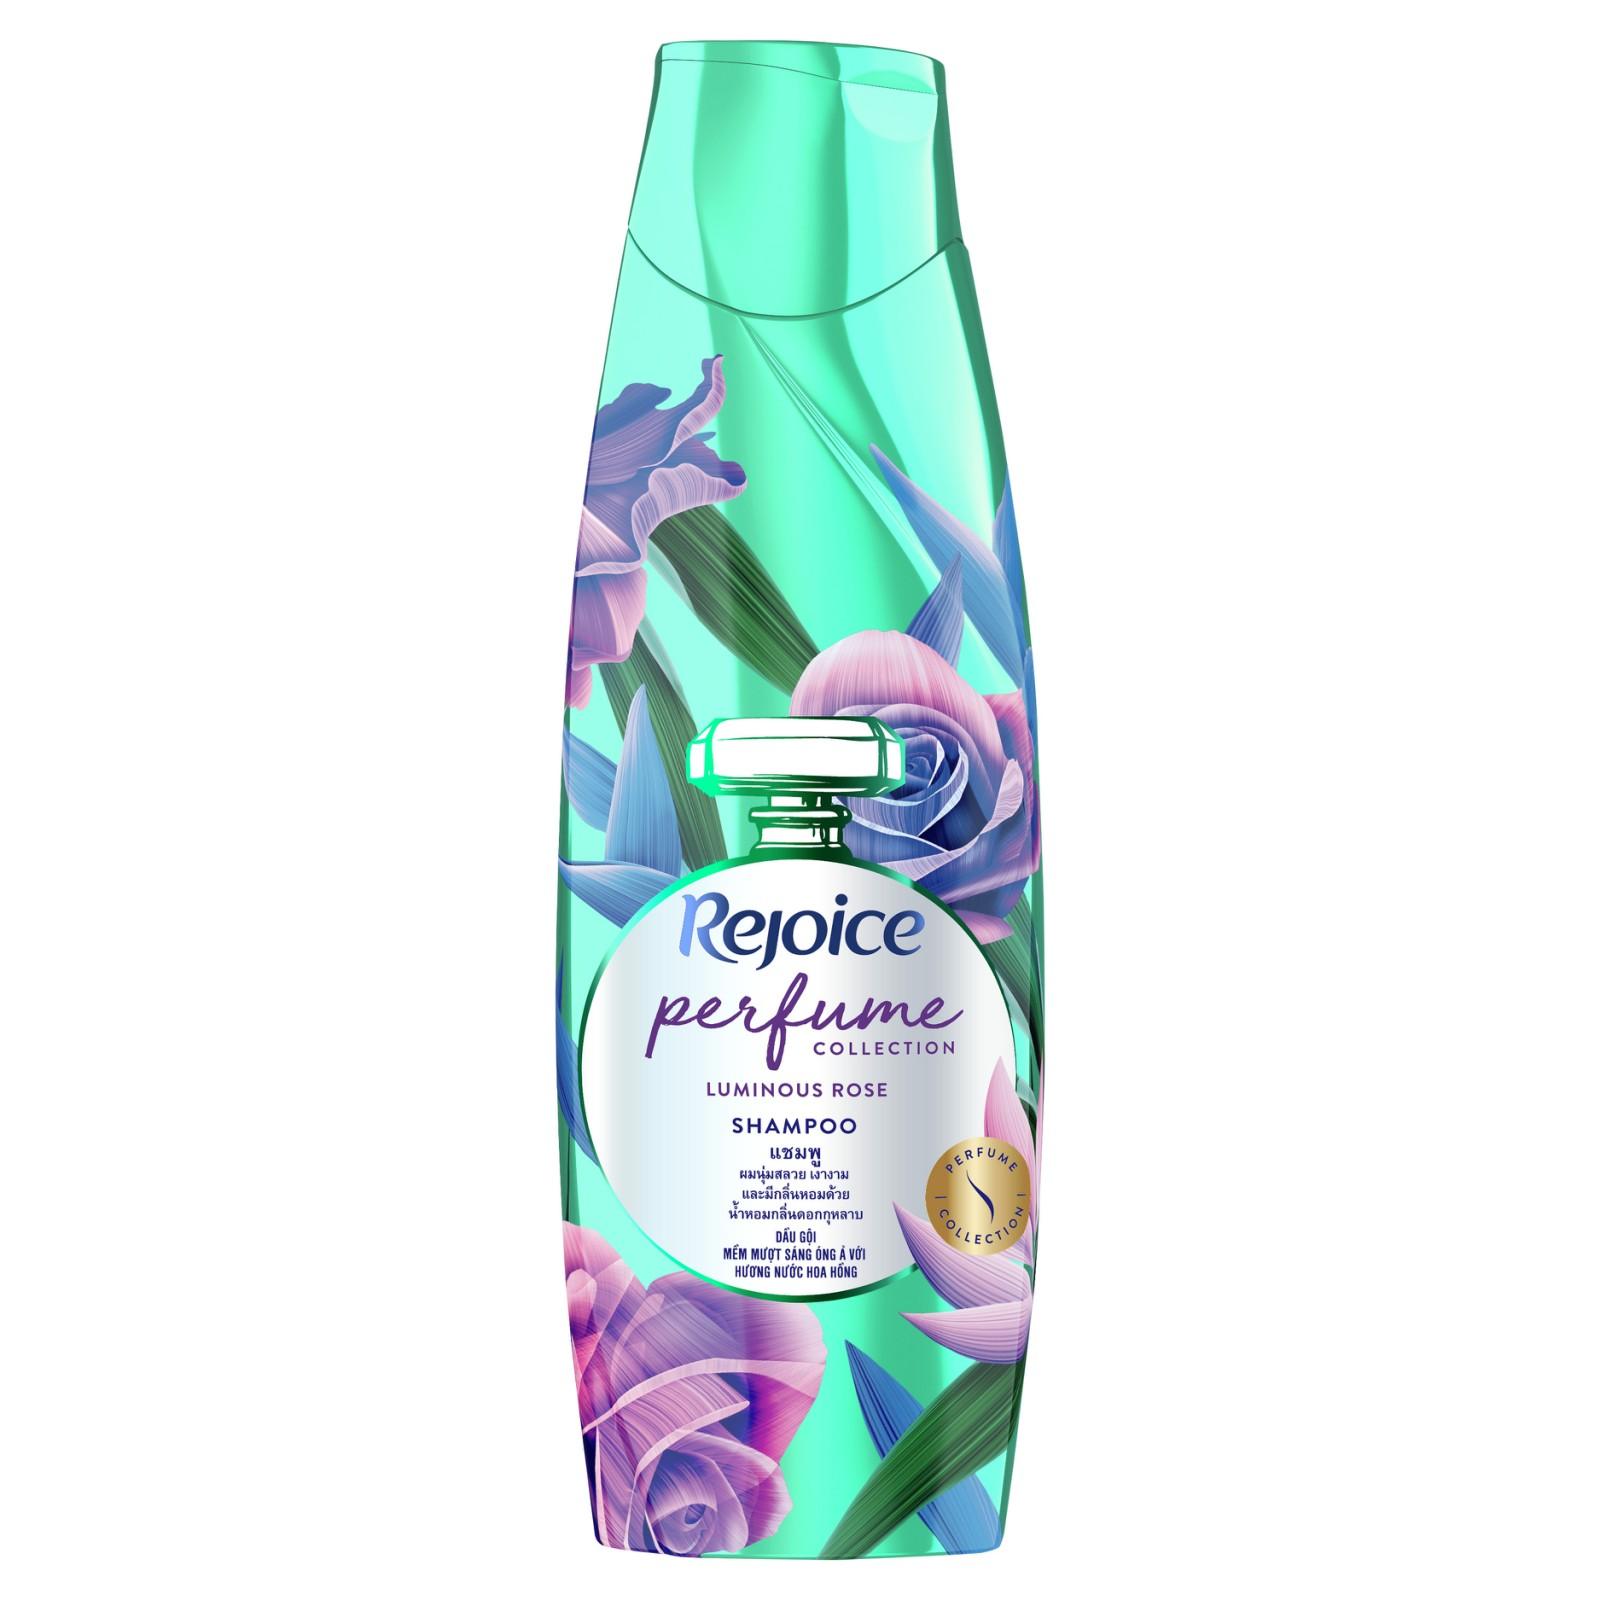 Rejoice Luminous Rose Shampoo 170ml